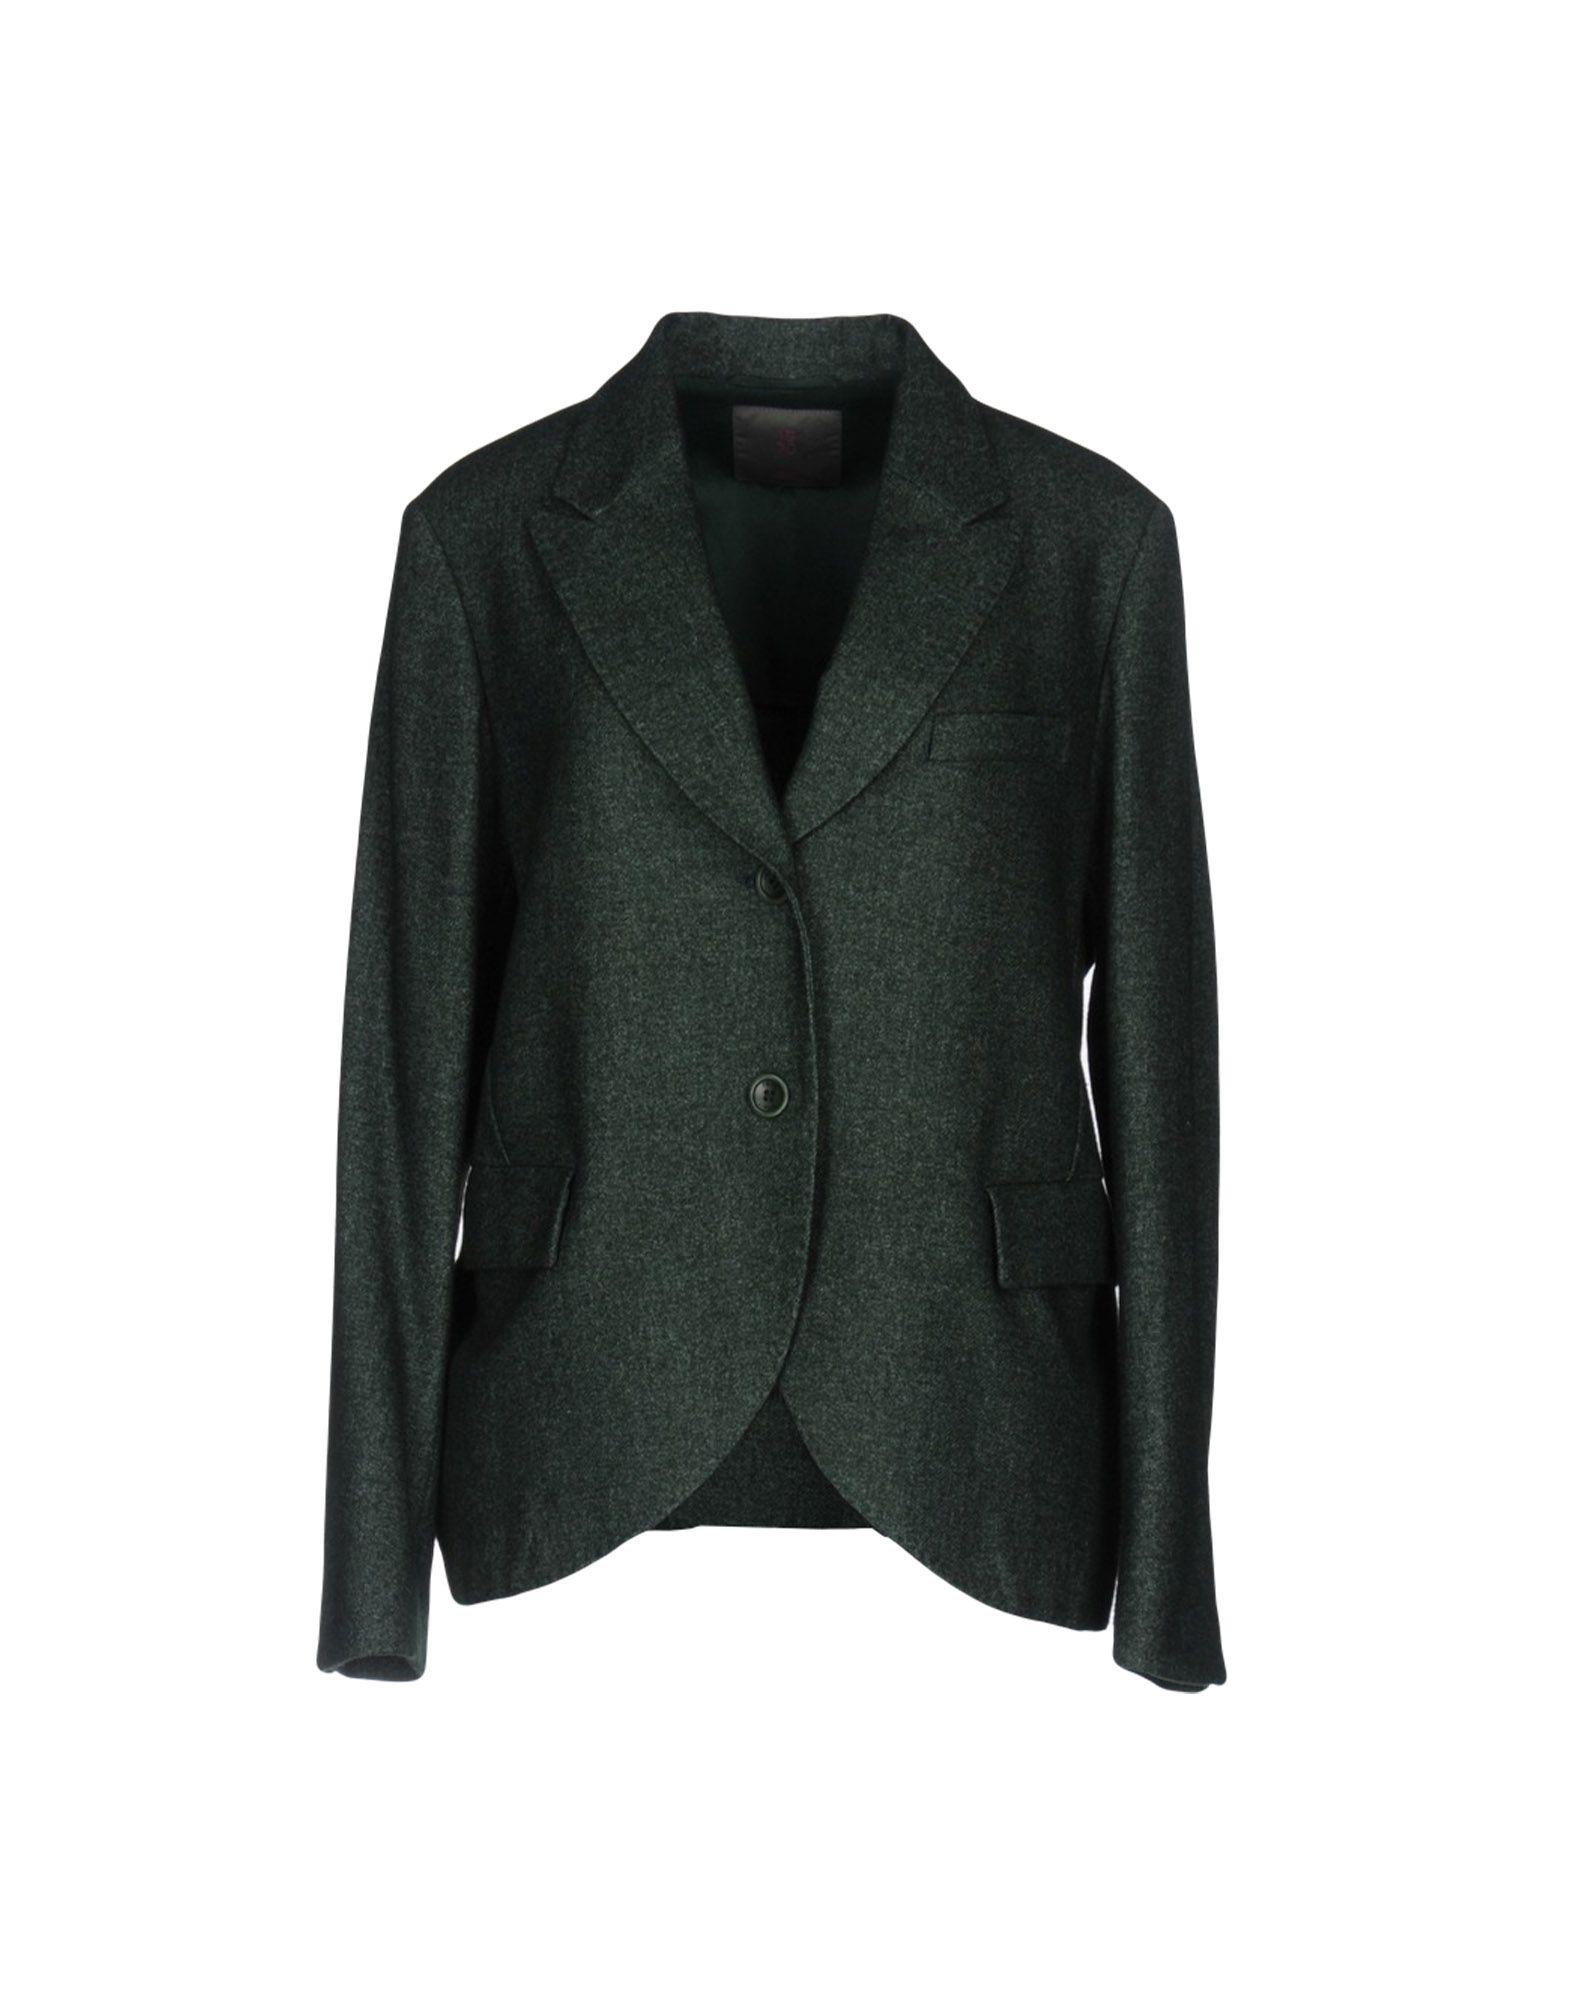 19.70 NINETEEN SEVENTY Damen Jackett Farbe Dunkelgrün Größe 6 jetztbilligerkaufen